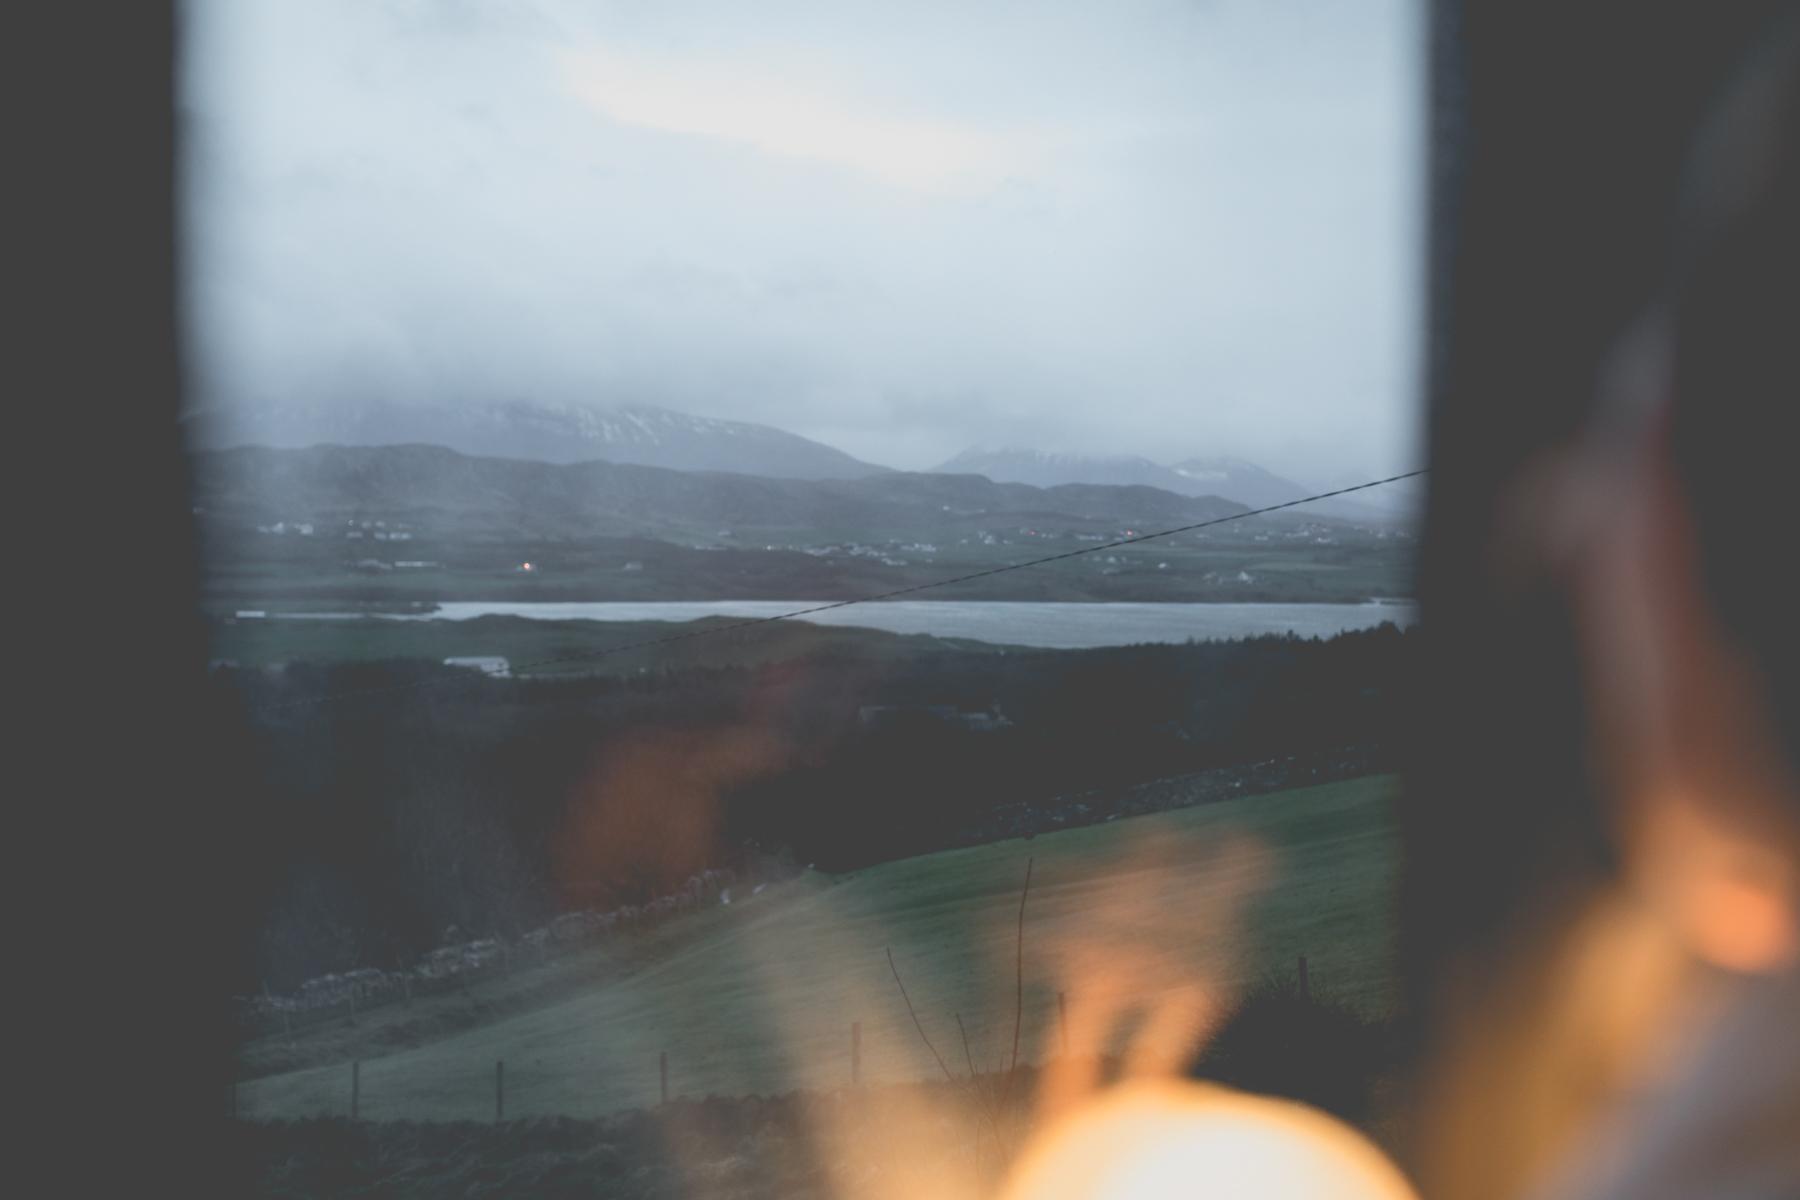 koto_Breac_Hse_Donegal_JLphoto-63.jpg